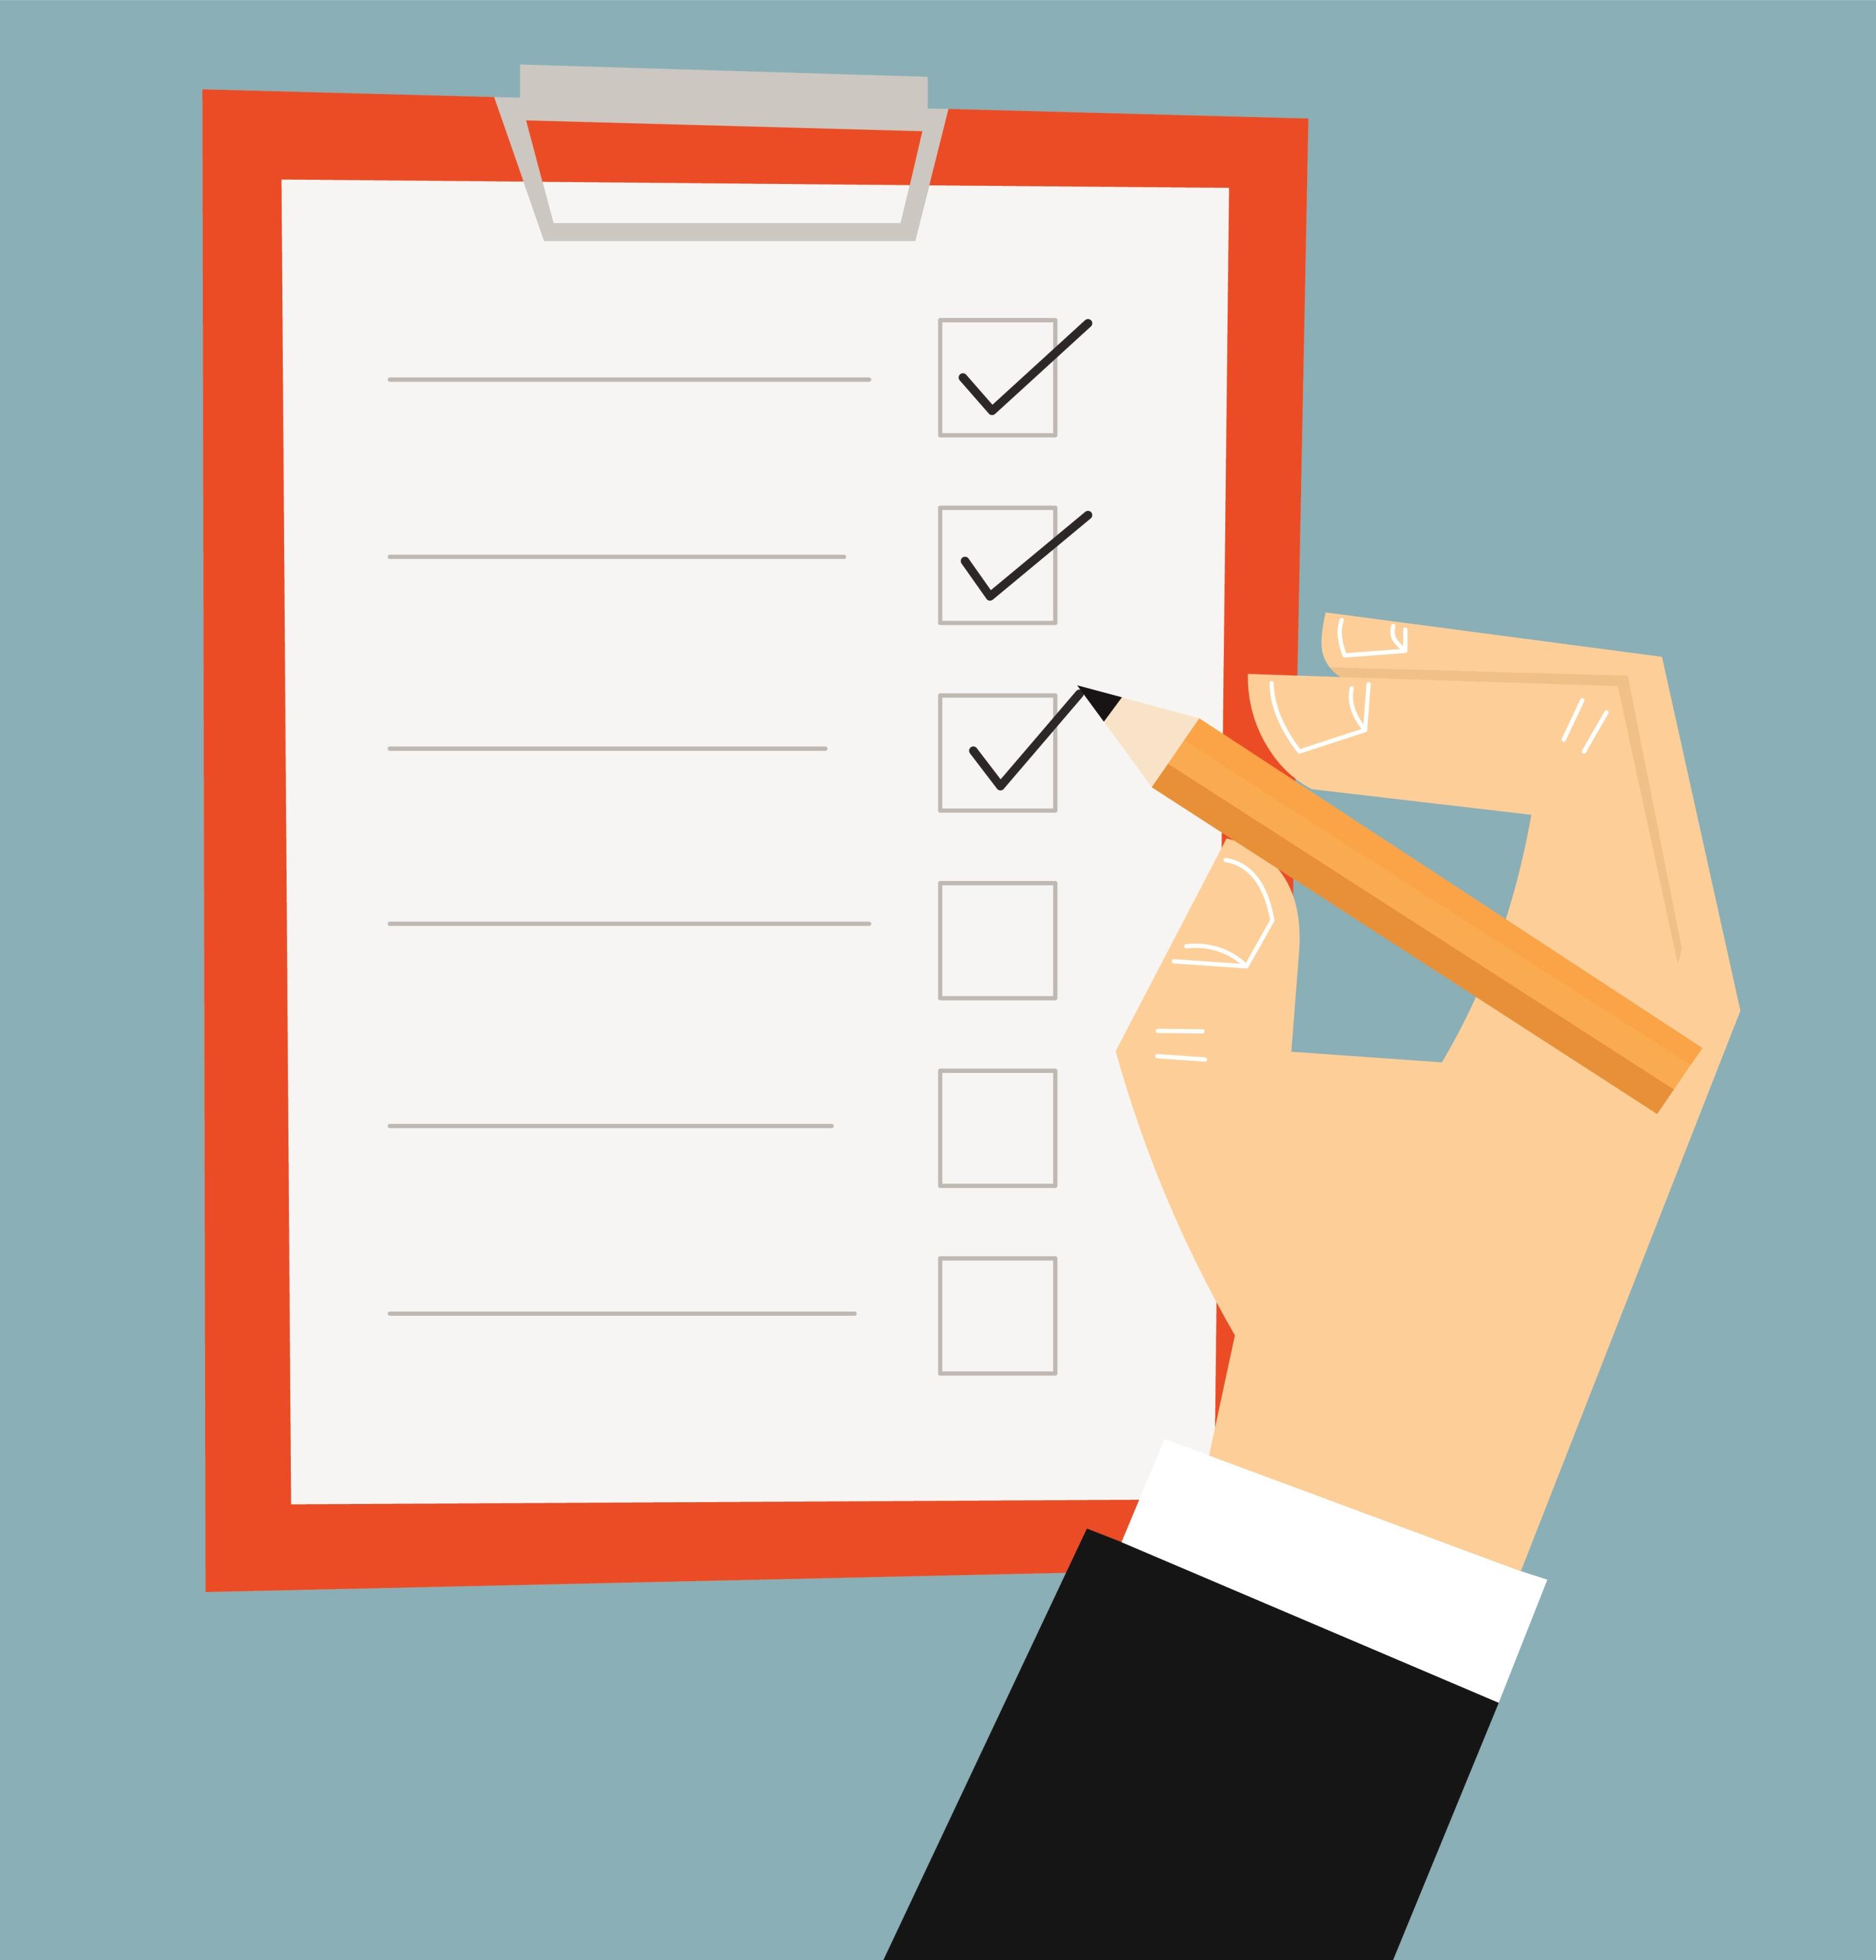 8 Pasos para implementar un correcto proceso de calificación de Leads